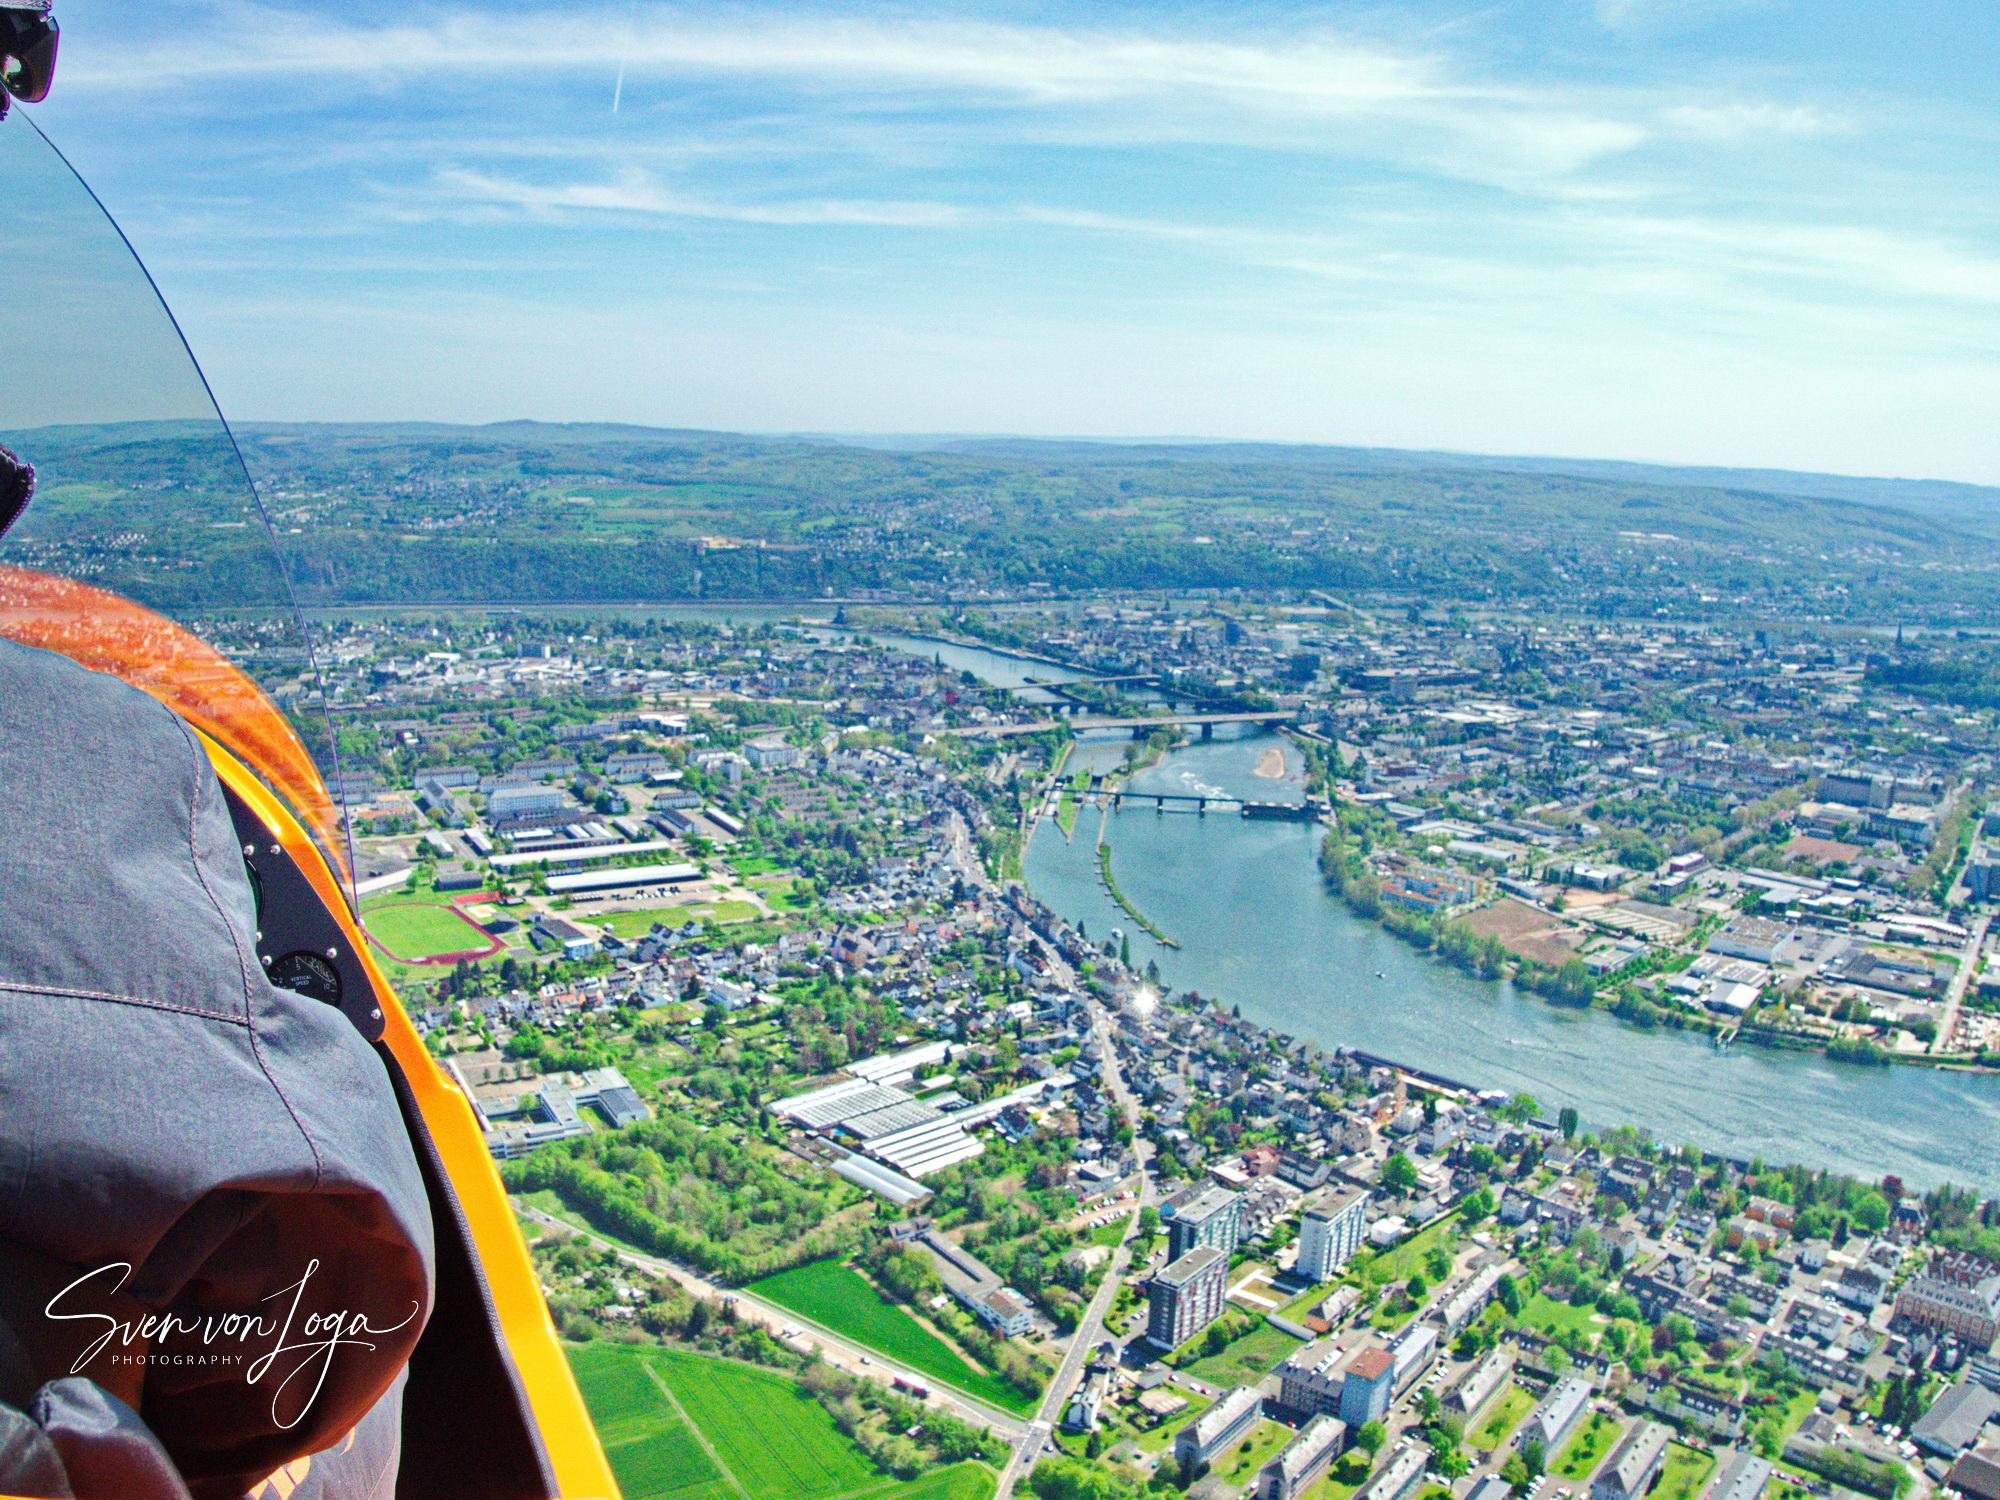 Der große Rheinlandflug – mit dem Gyrocopter  über Rhein, Mosel und Vulkaneifel